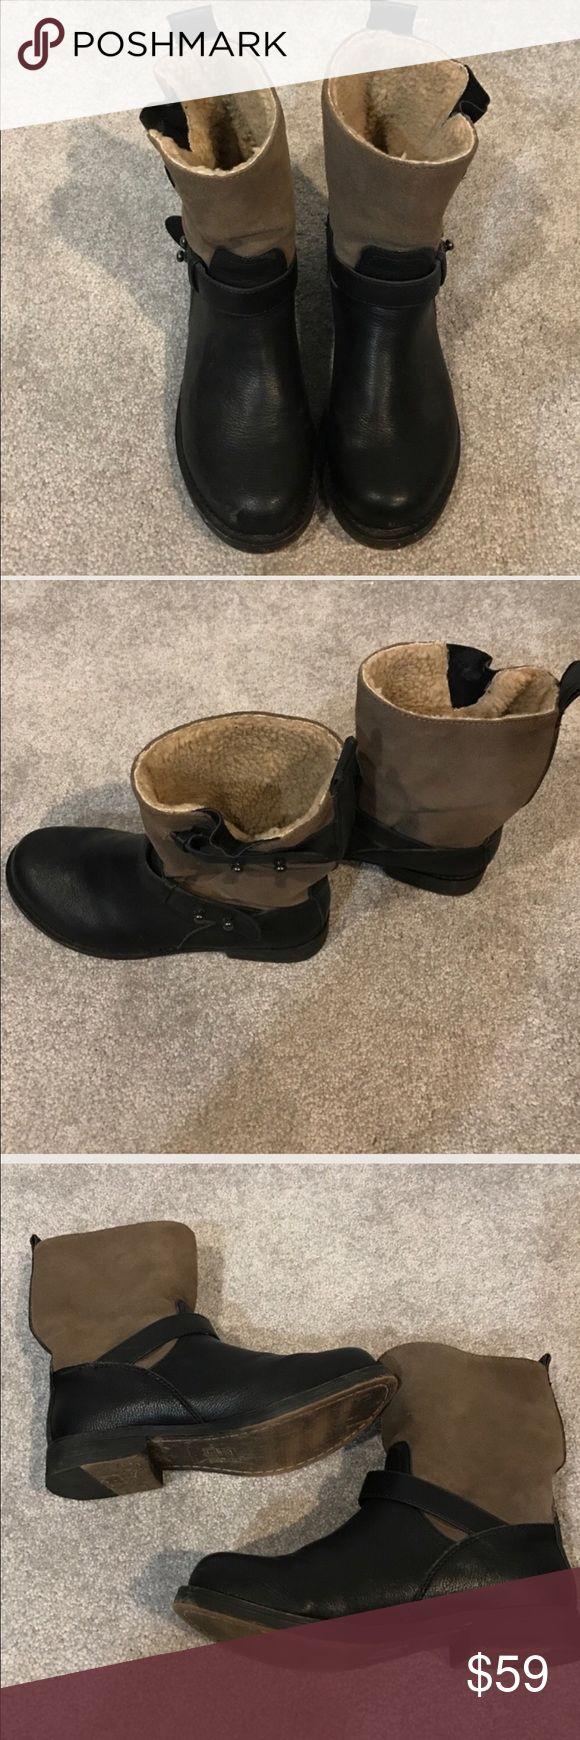 ALDO BOOTS BLACK/TAUPEish SIZE 7 ALDO BOOTS BLACK/TAUPEish SIZE 7. Very good condition Aldo Shoes Combat & Moto Boots